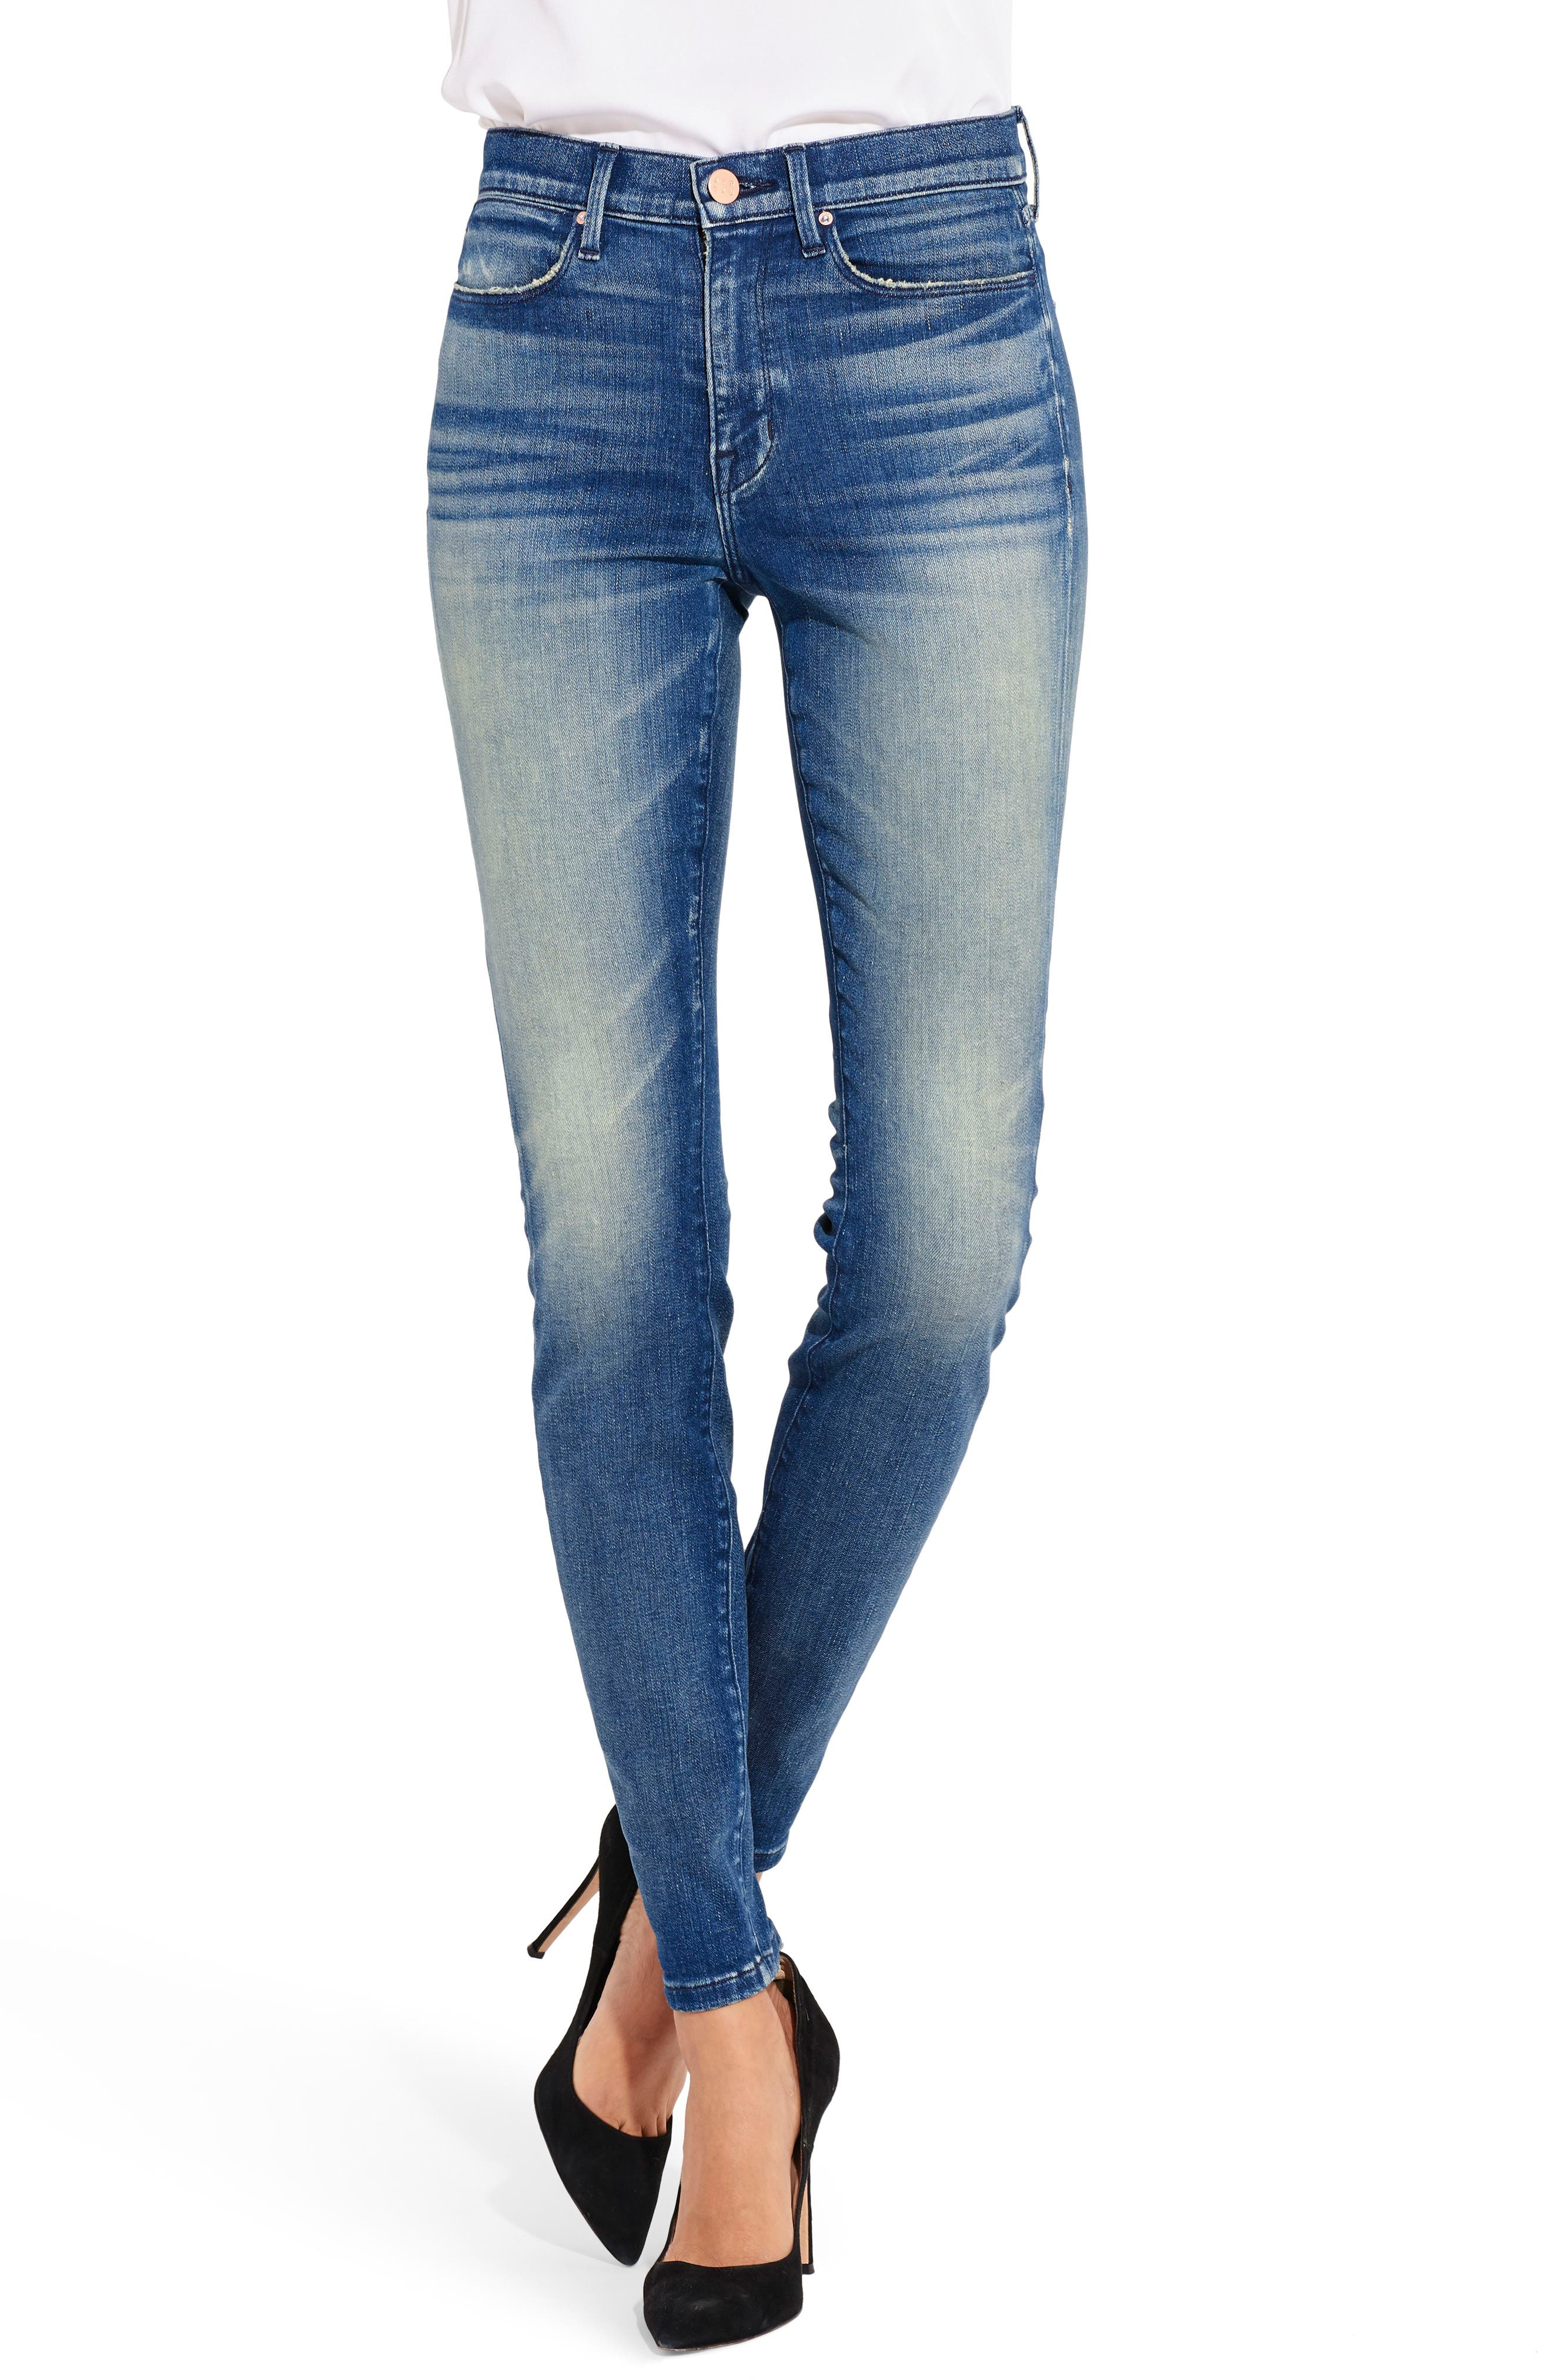 Alternate Image 1 Selected - AYR The Skinny Jeans (Papas Fritas)